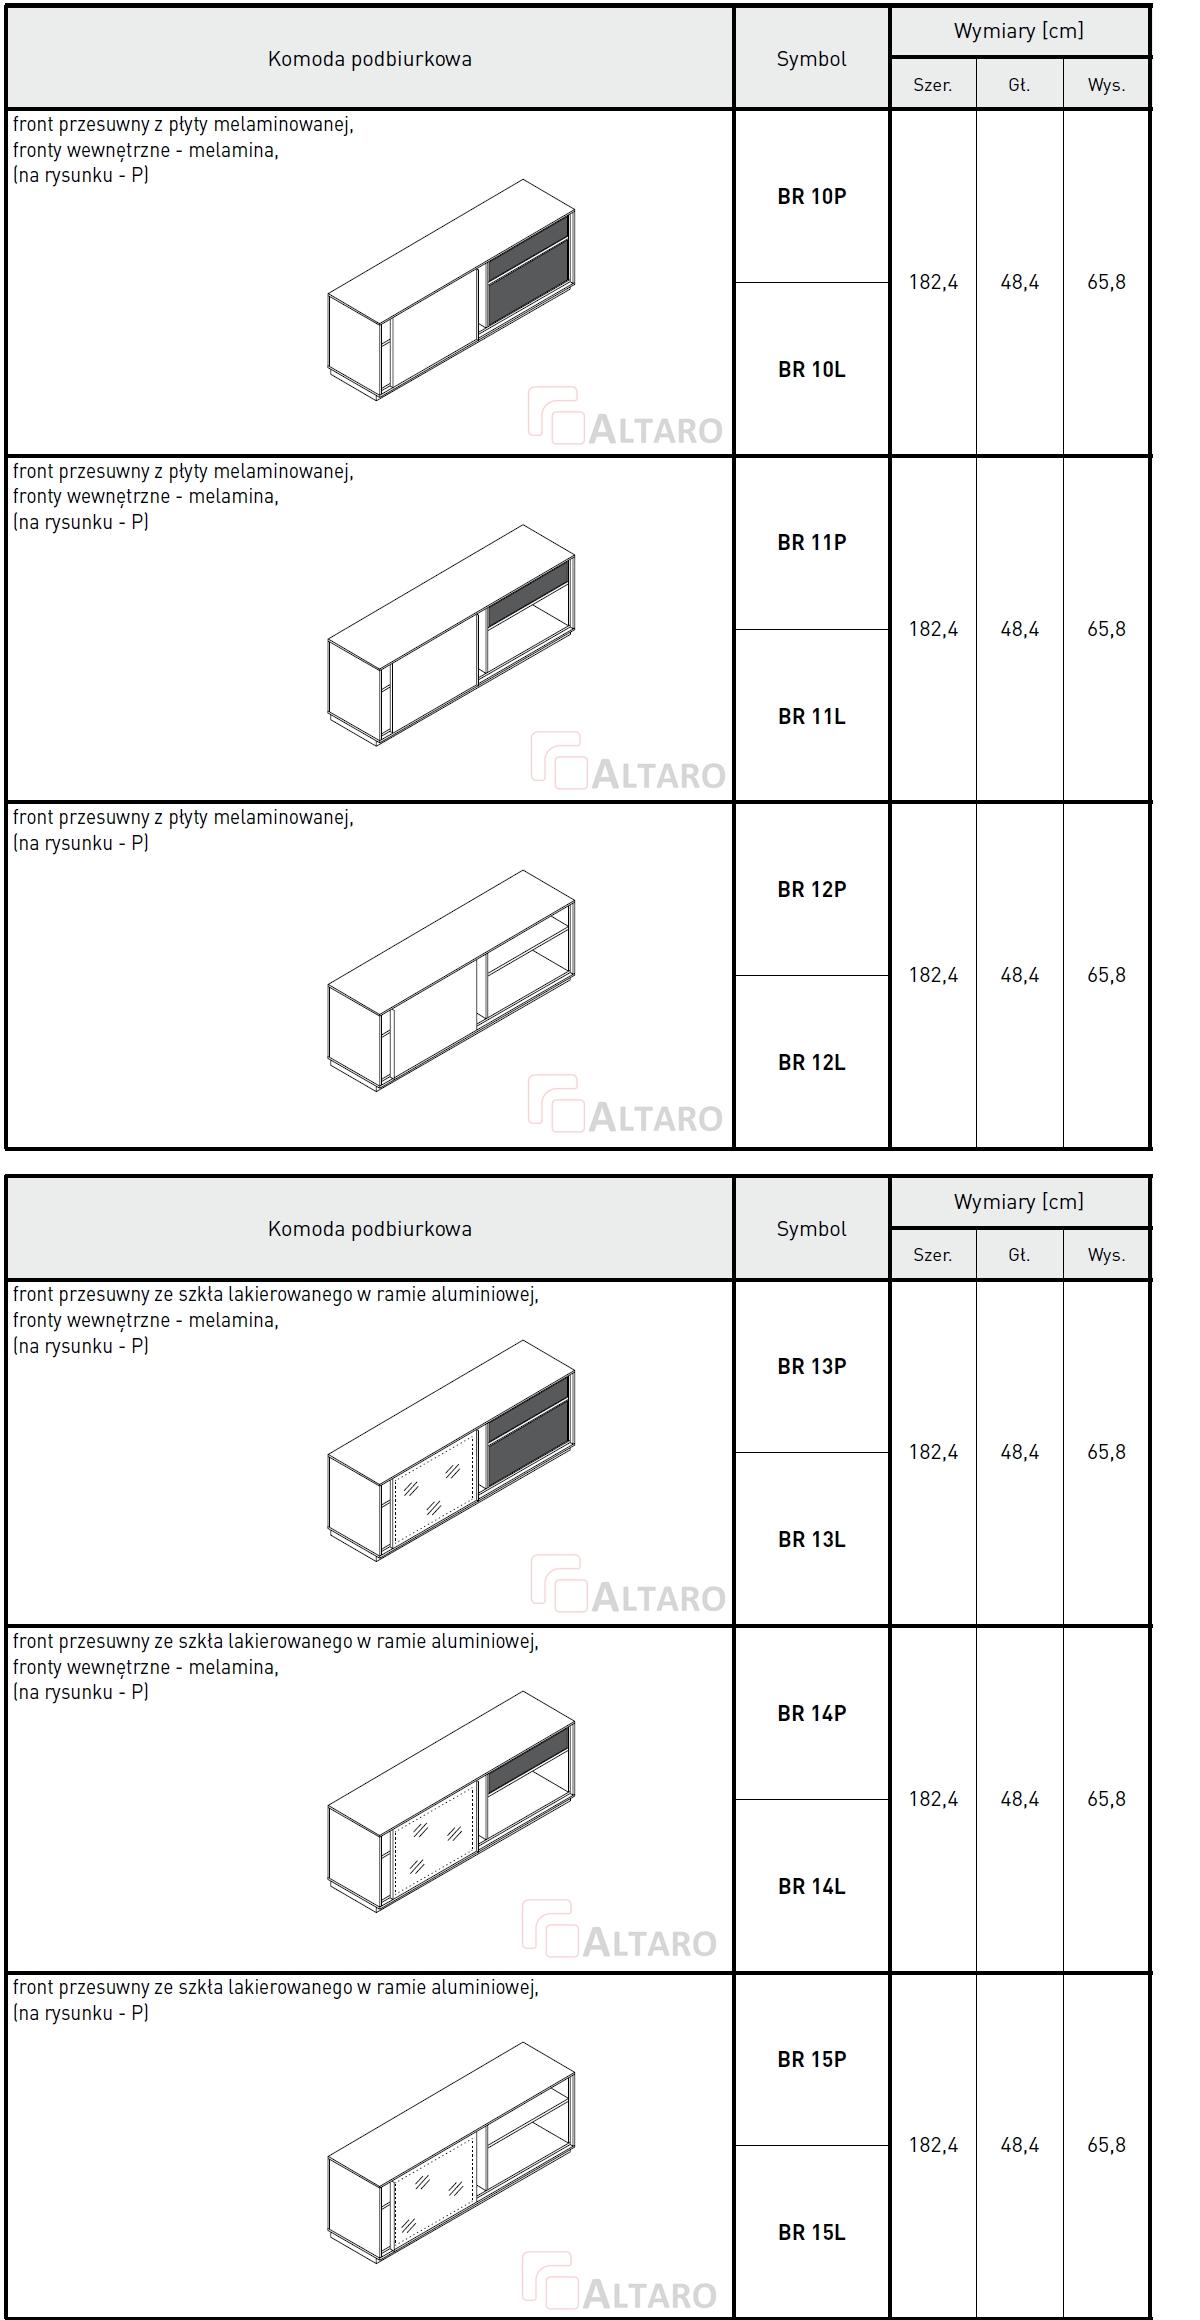 kontenry gabinetowe BRAND katalog v4 ALTARO